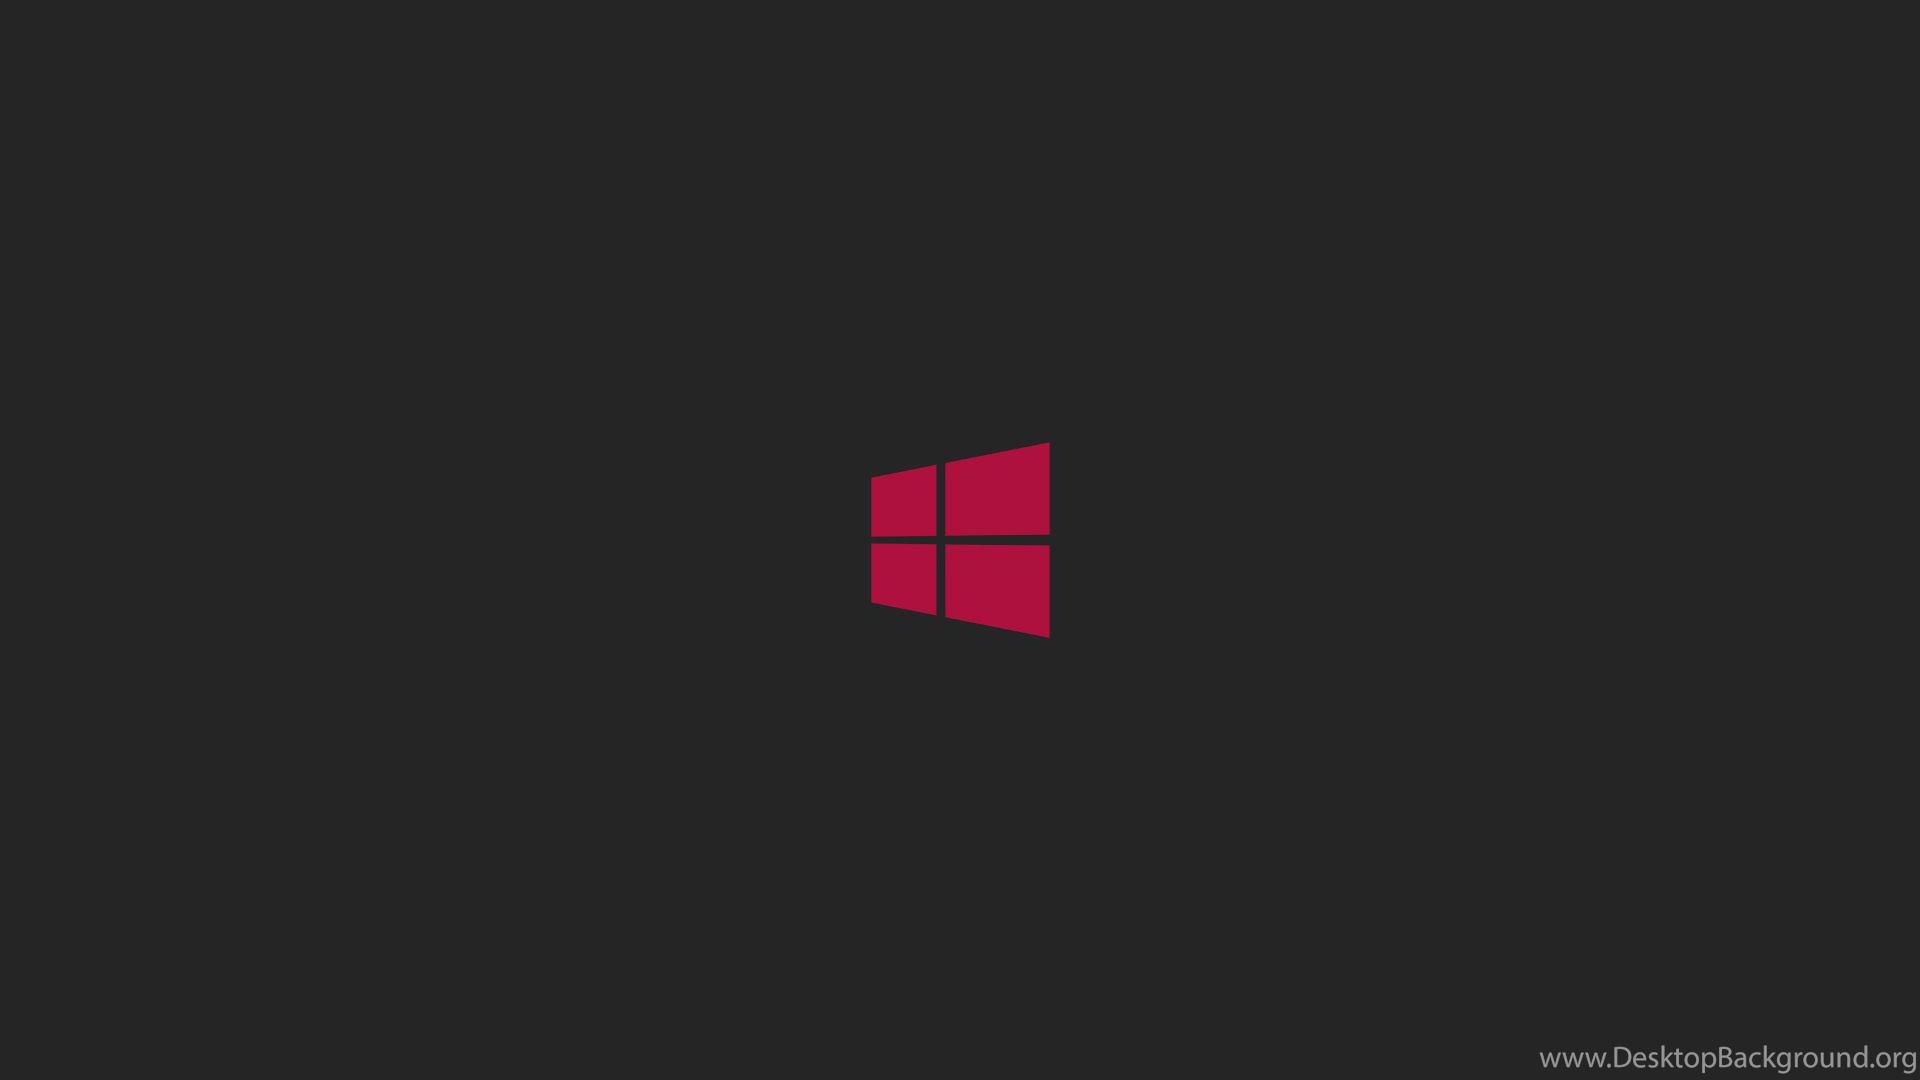 Windows 8 Wallpapers Hd Black Pink Logo Desktop Background